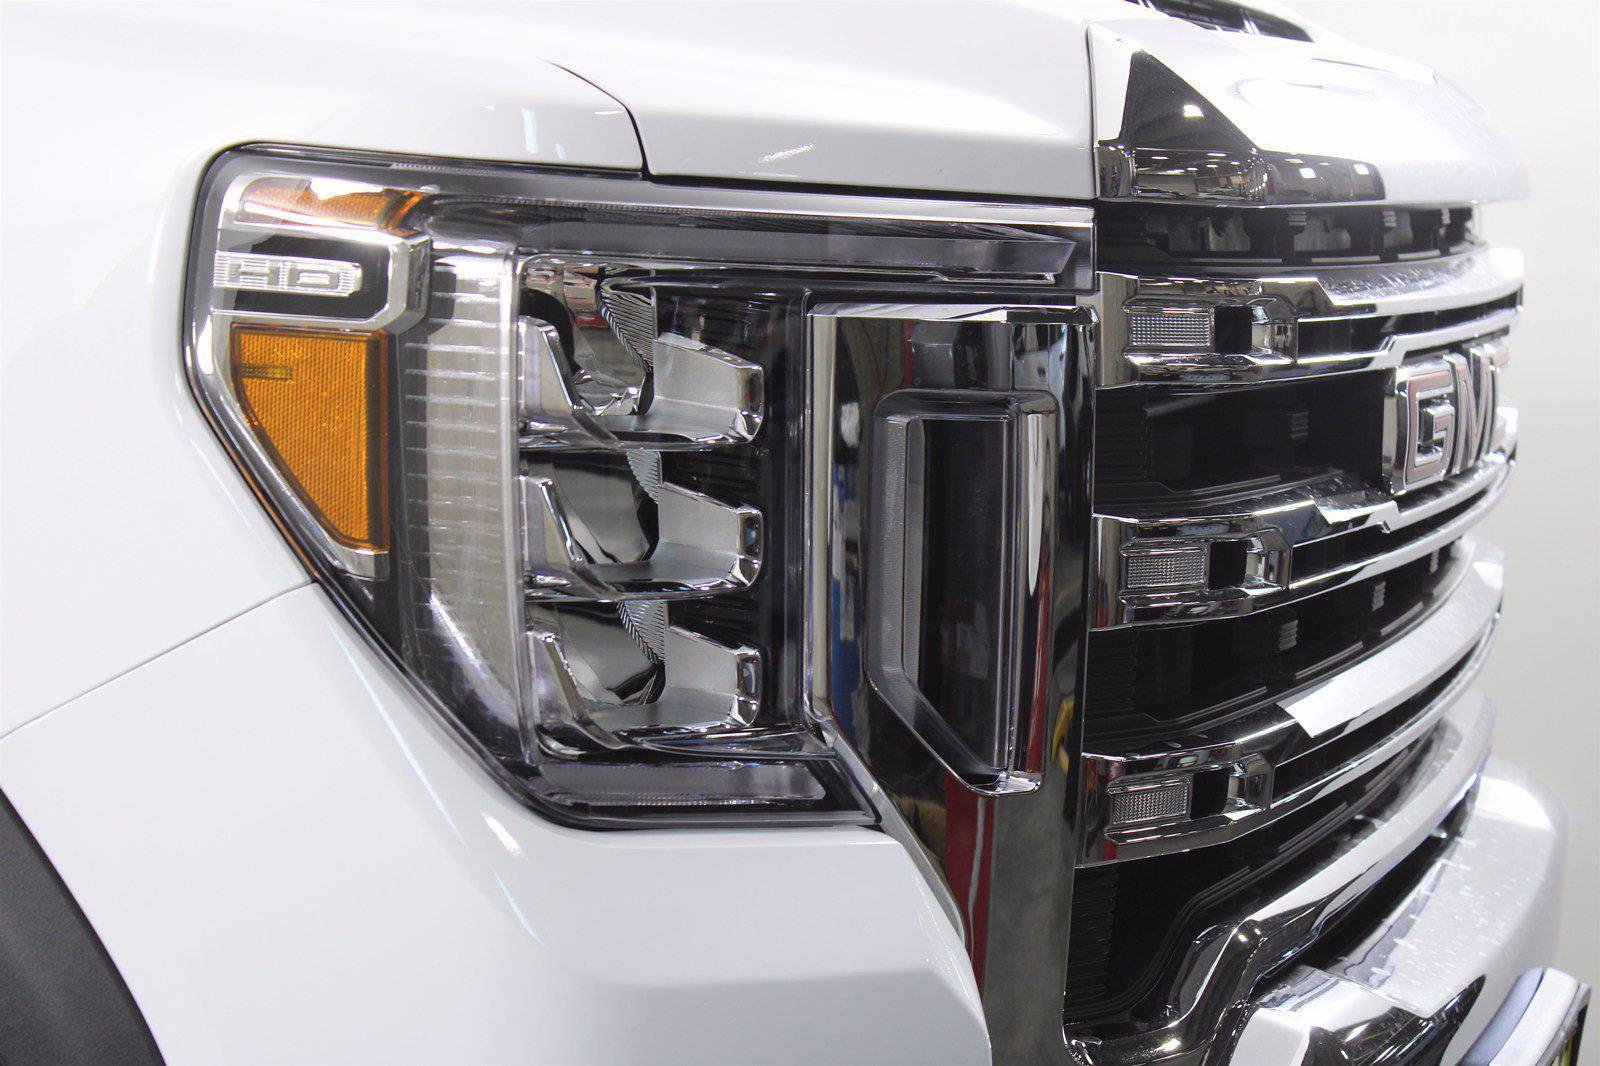 2021 GMC Sierra 2500 Regular Cab 4x4, Pickup #D411028 - photo 5